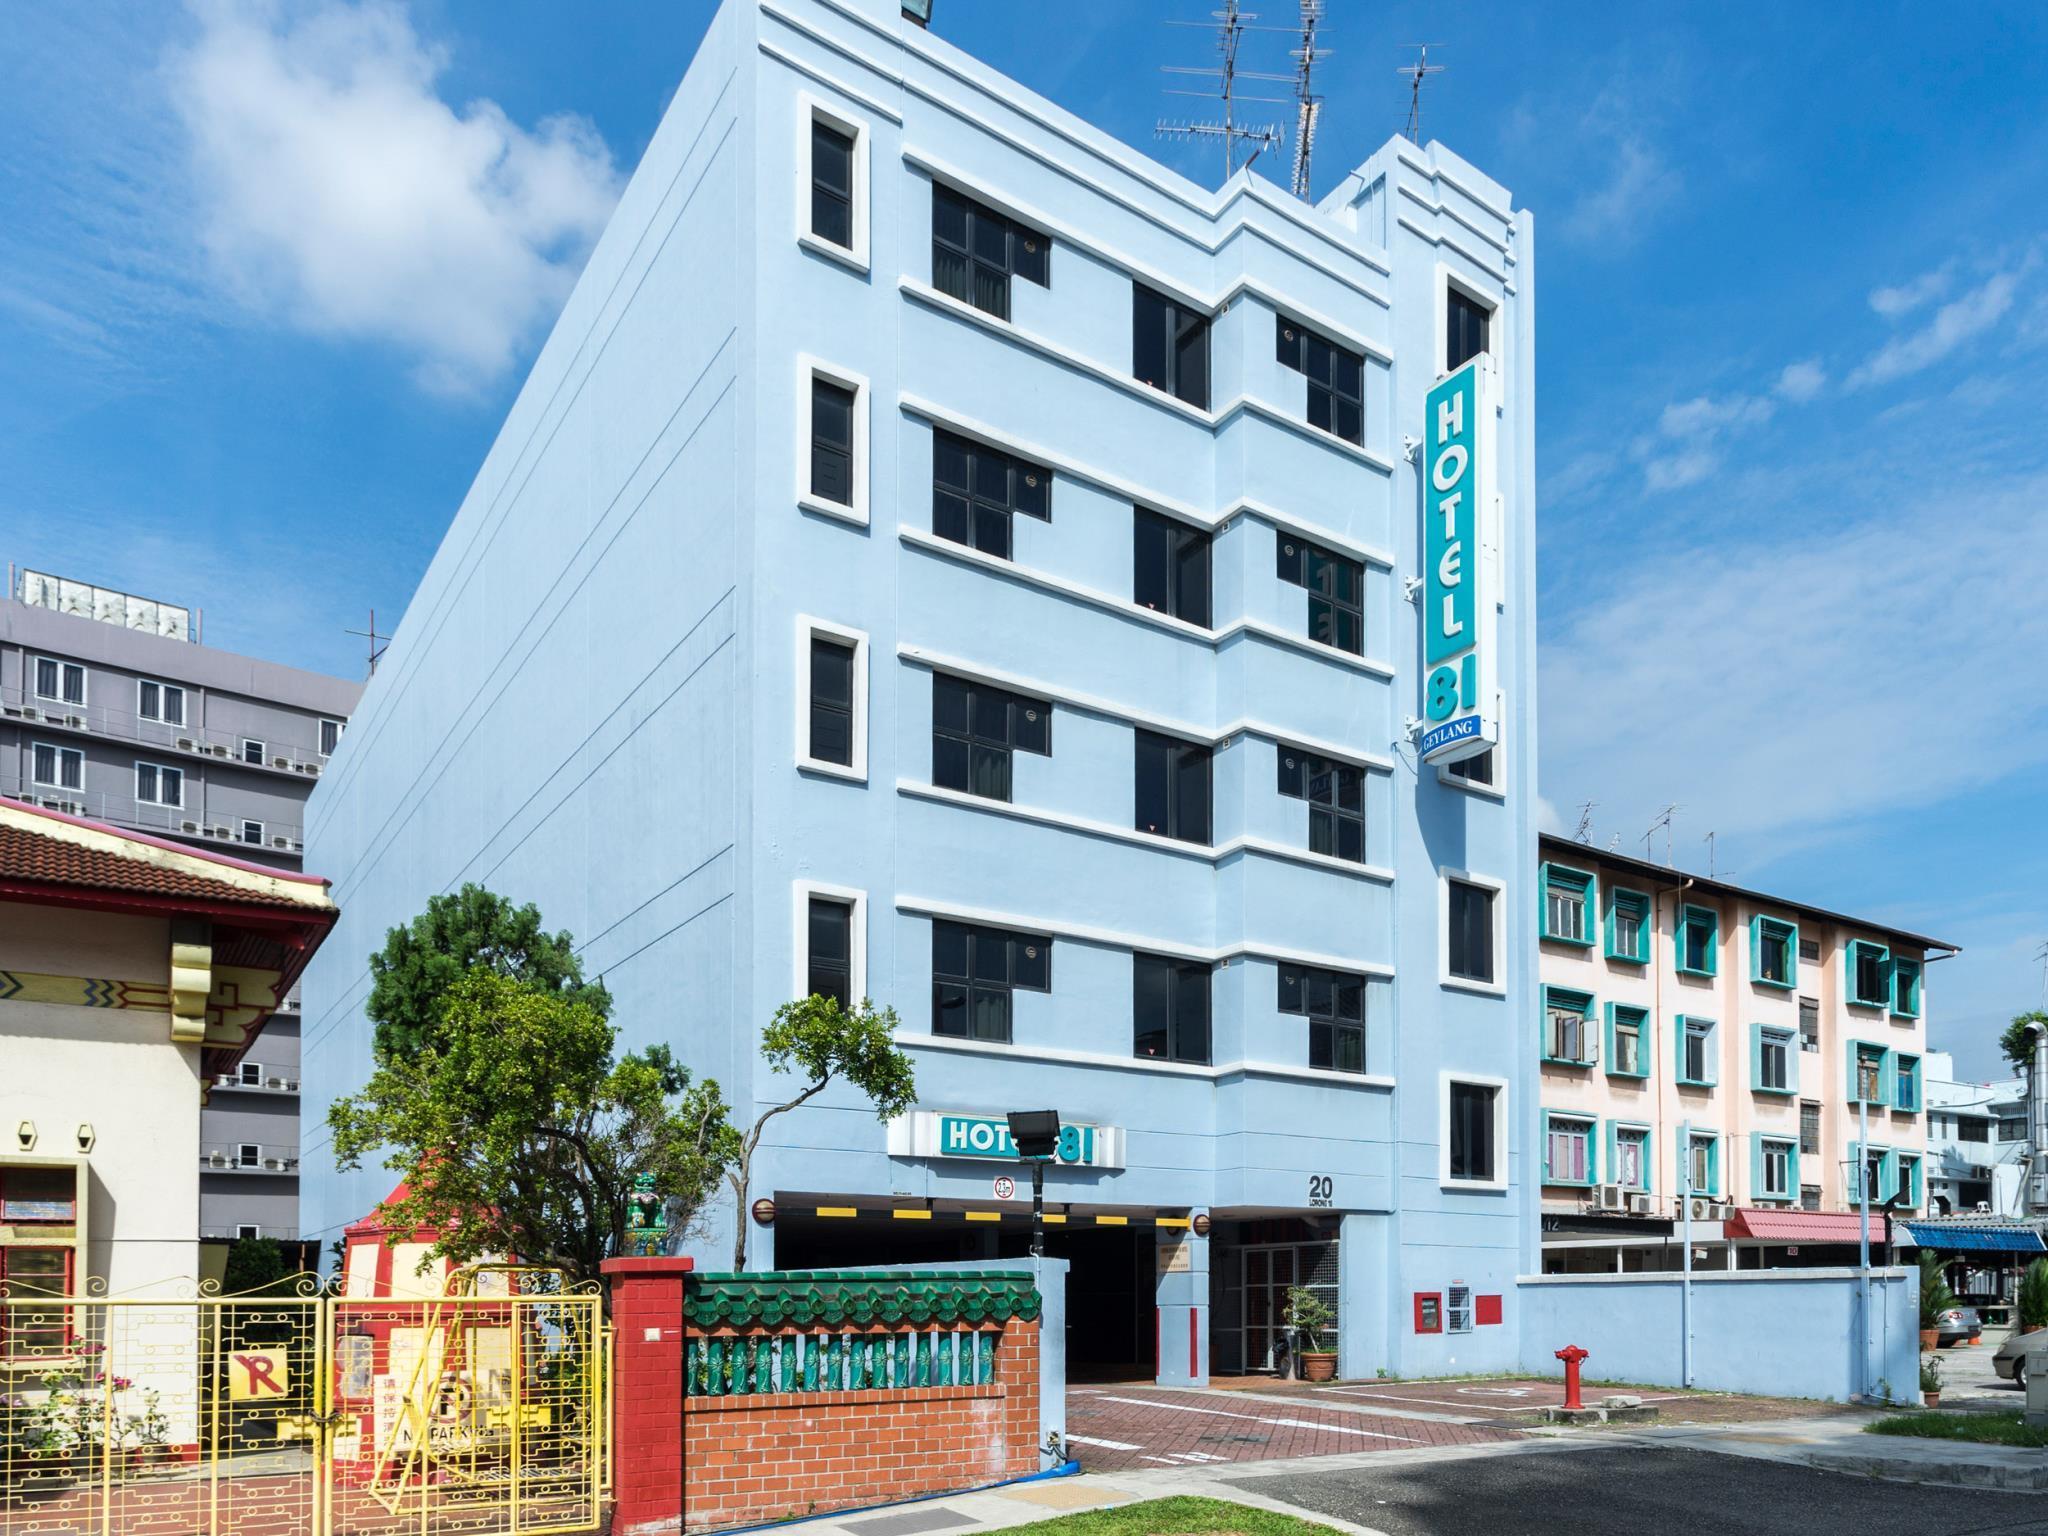 Hotel 81 geylang geylang singapore singapore great for Hotels 81 in singapore